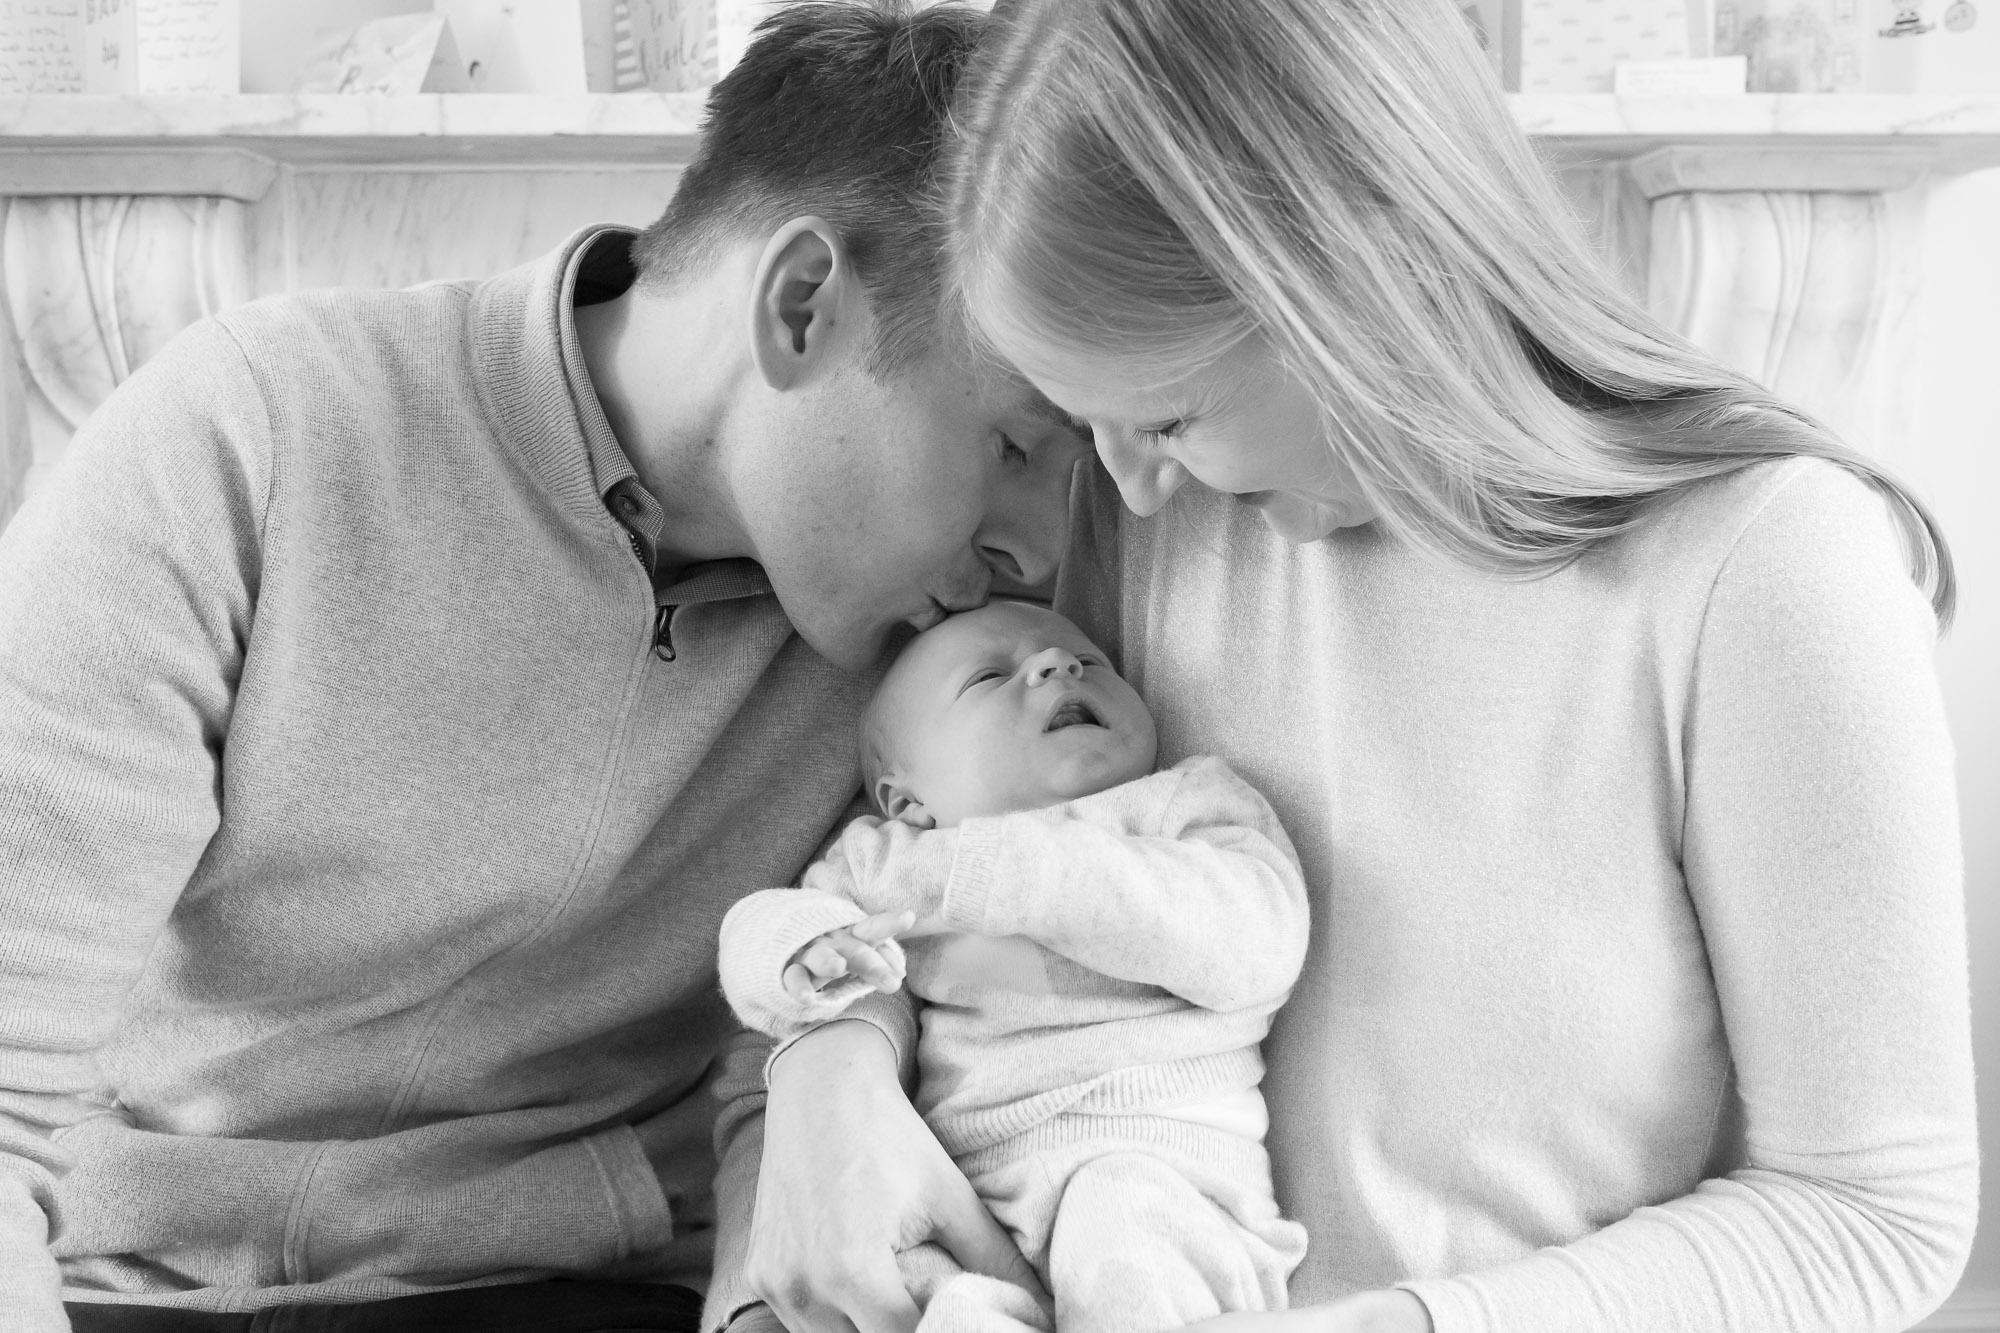 newborn-baby-family-portrait-photographer-119.jpg